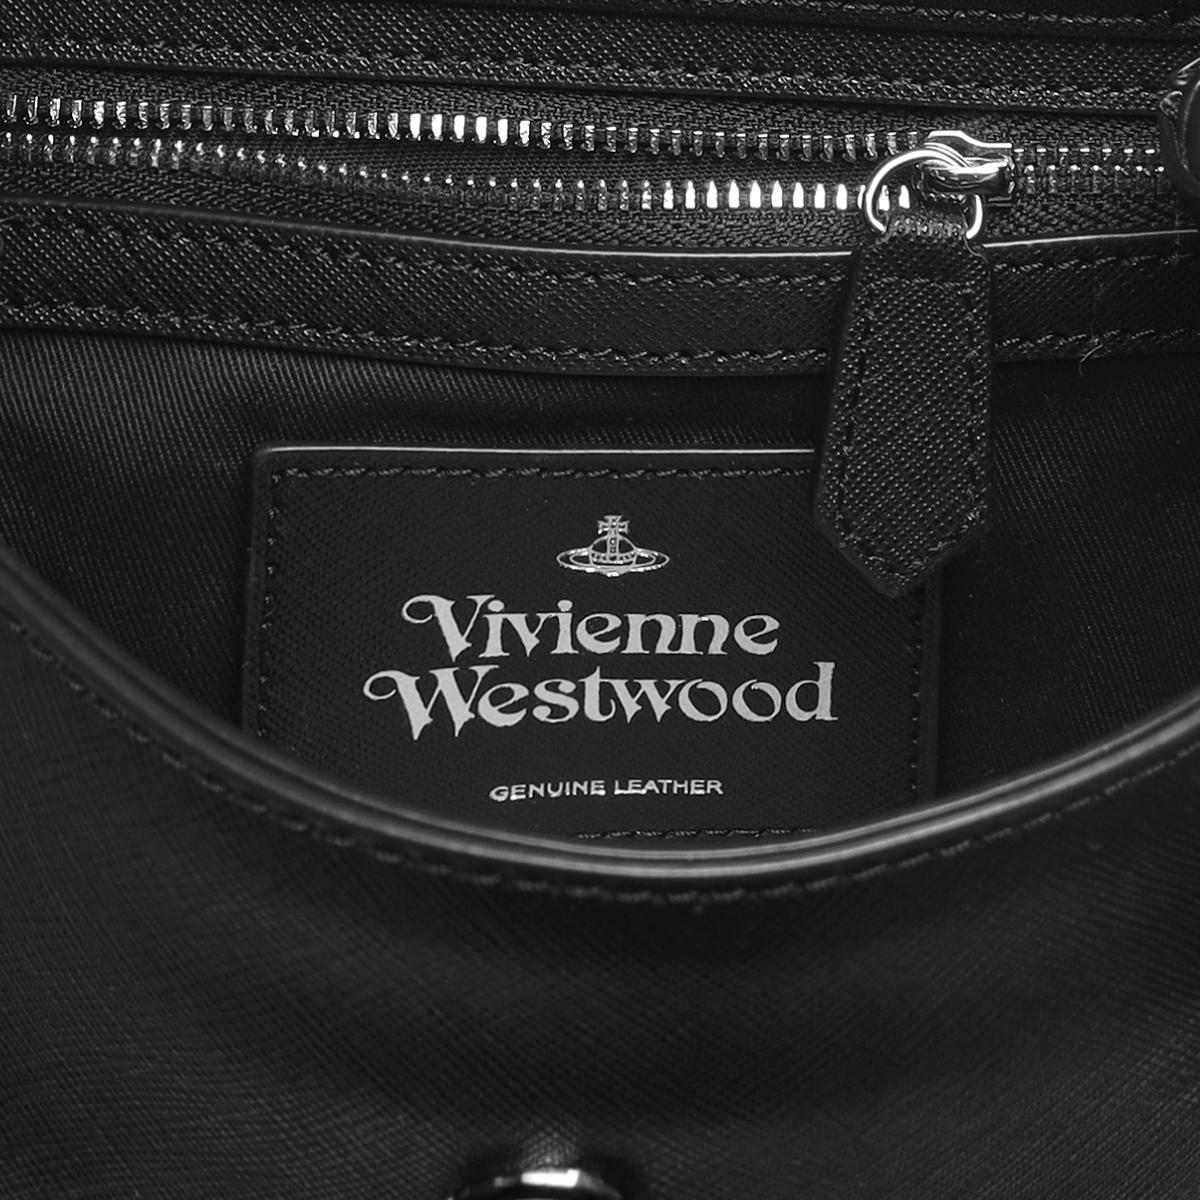 VIVIENNE WESTWOOD ヴィヴィアン ウエストウッド   ショルダー付 バケットバッグ   DEBBIE デビー